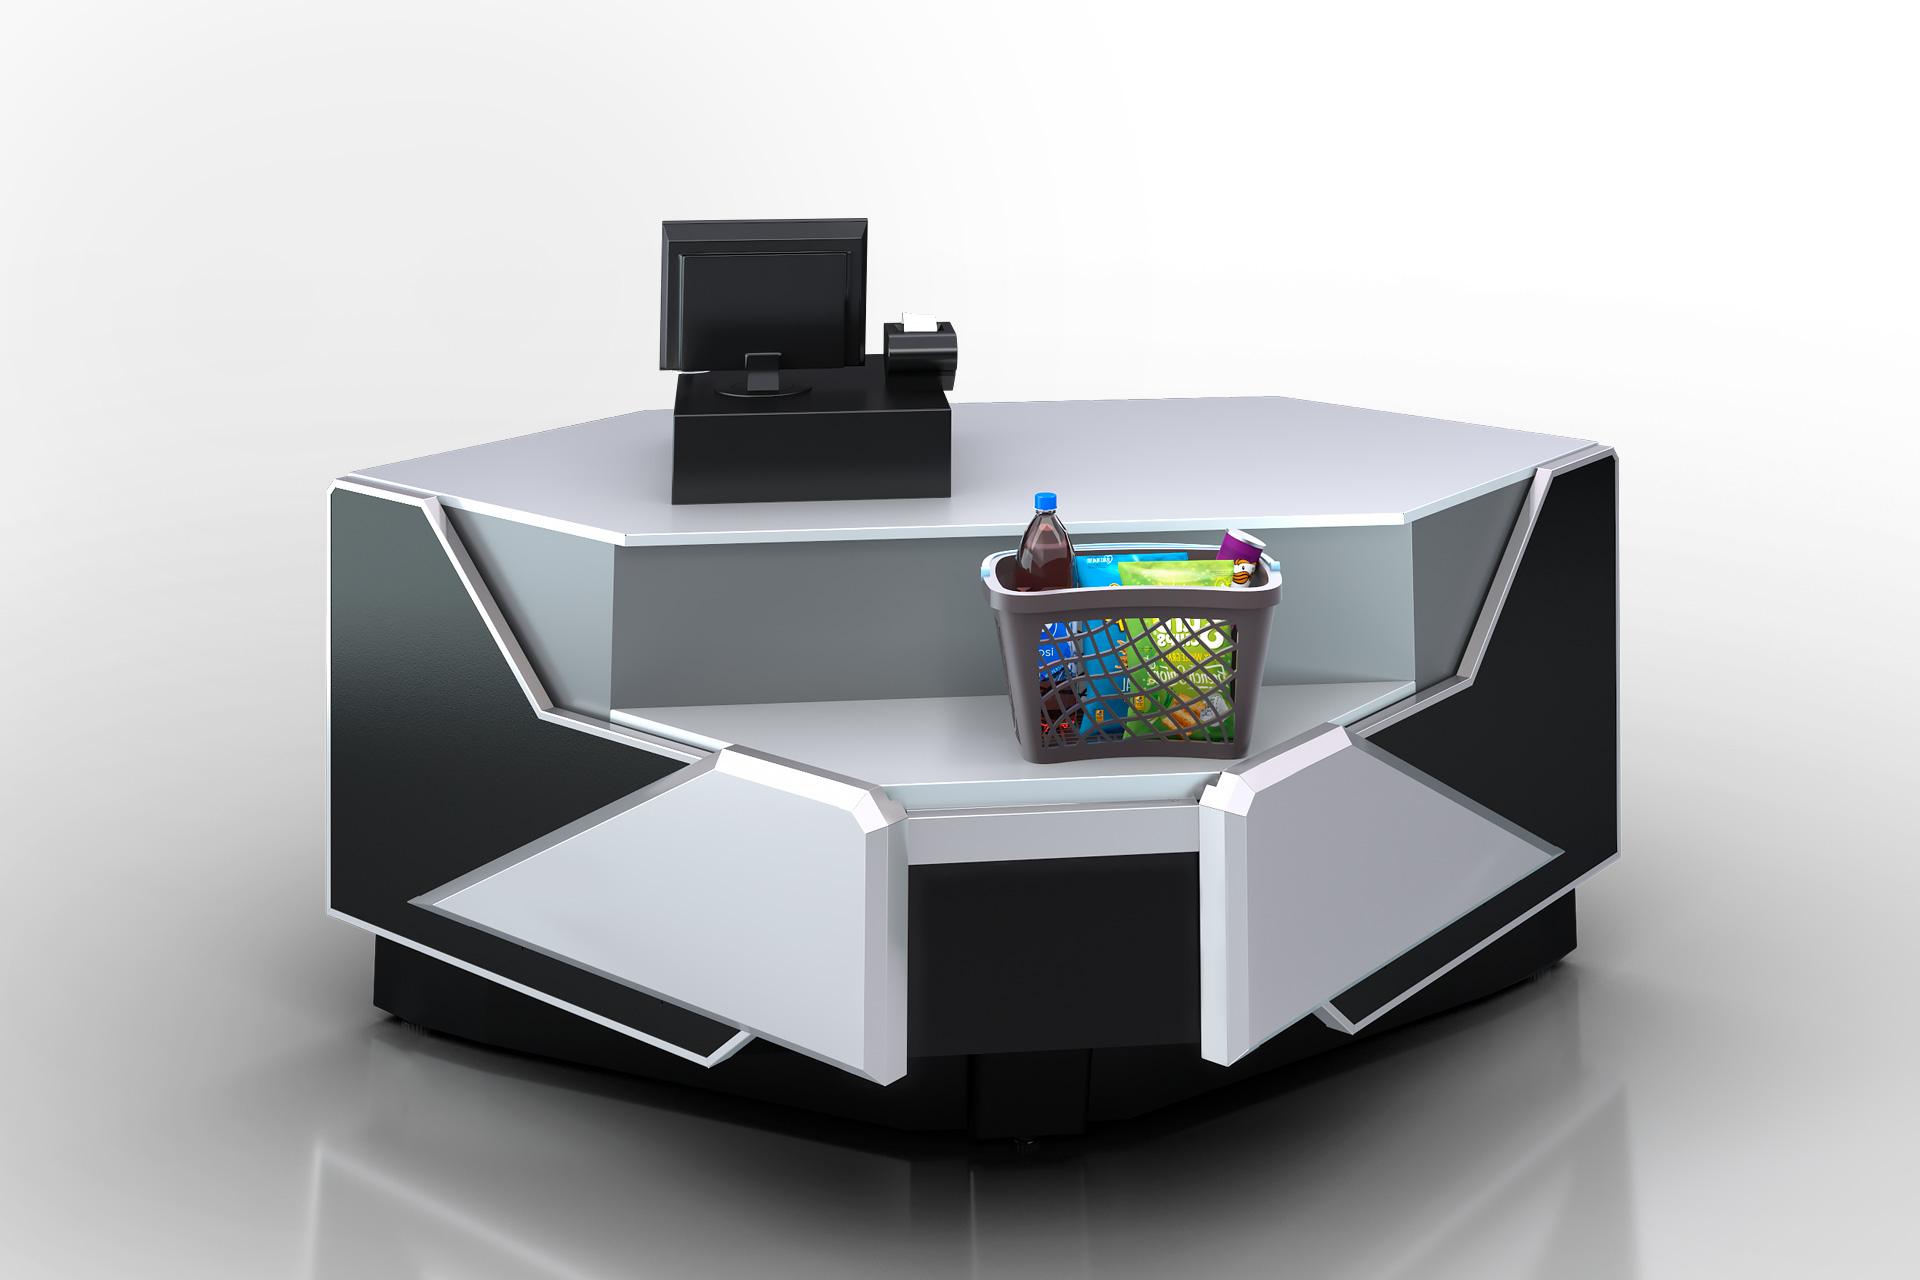 Витрина Missouri enigma NC 122 cash desk 084-IR90